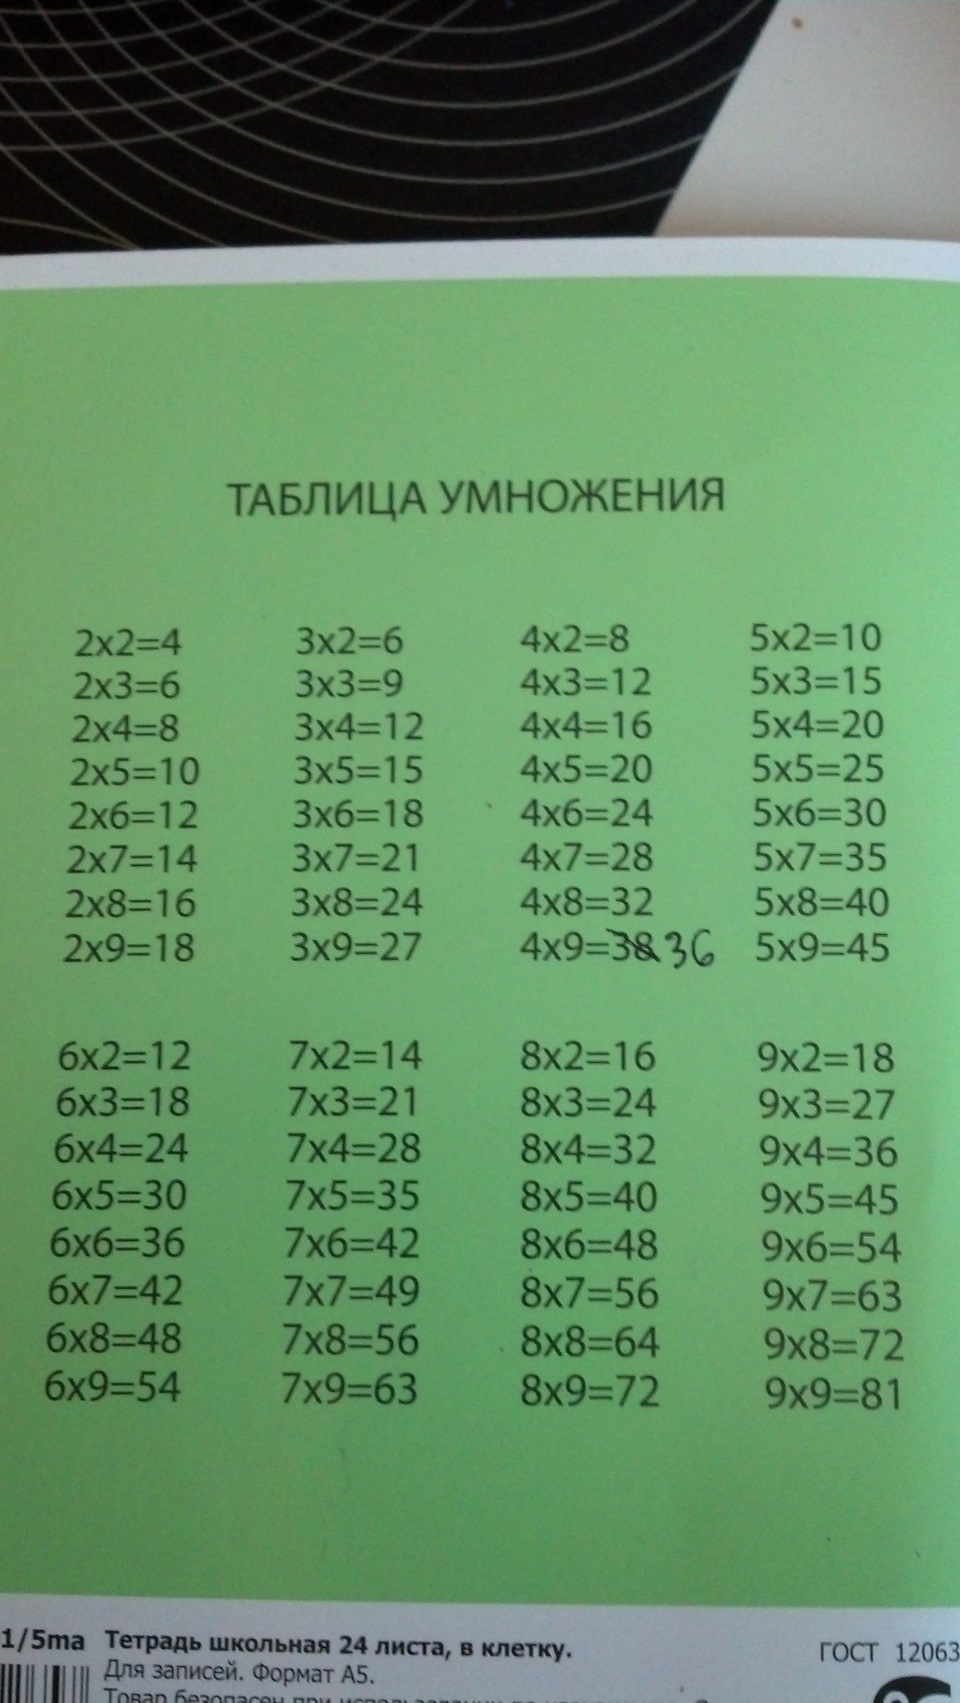 Stebesh › блог › таблица умножения